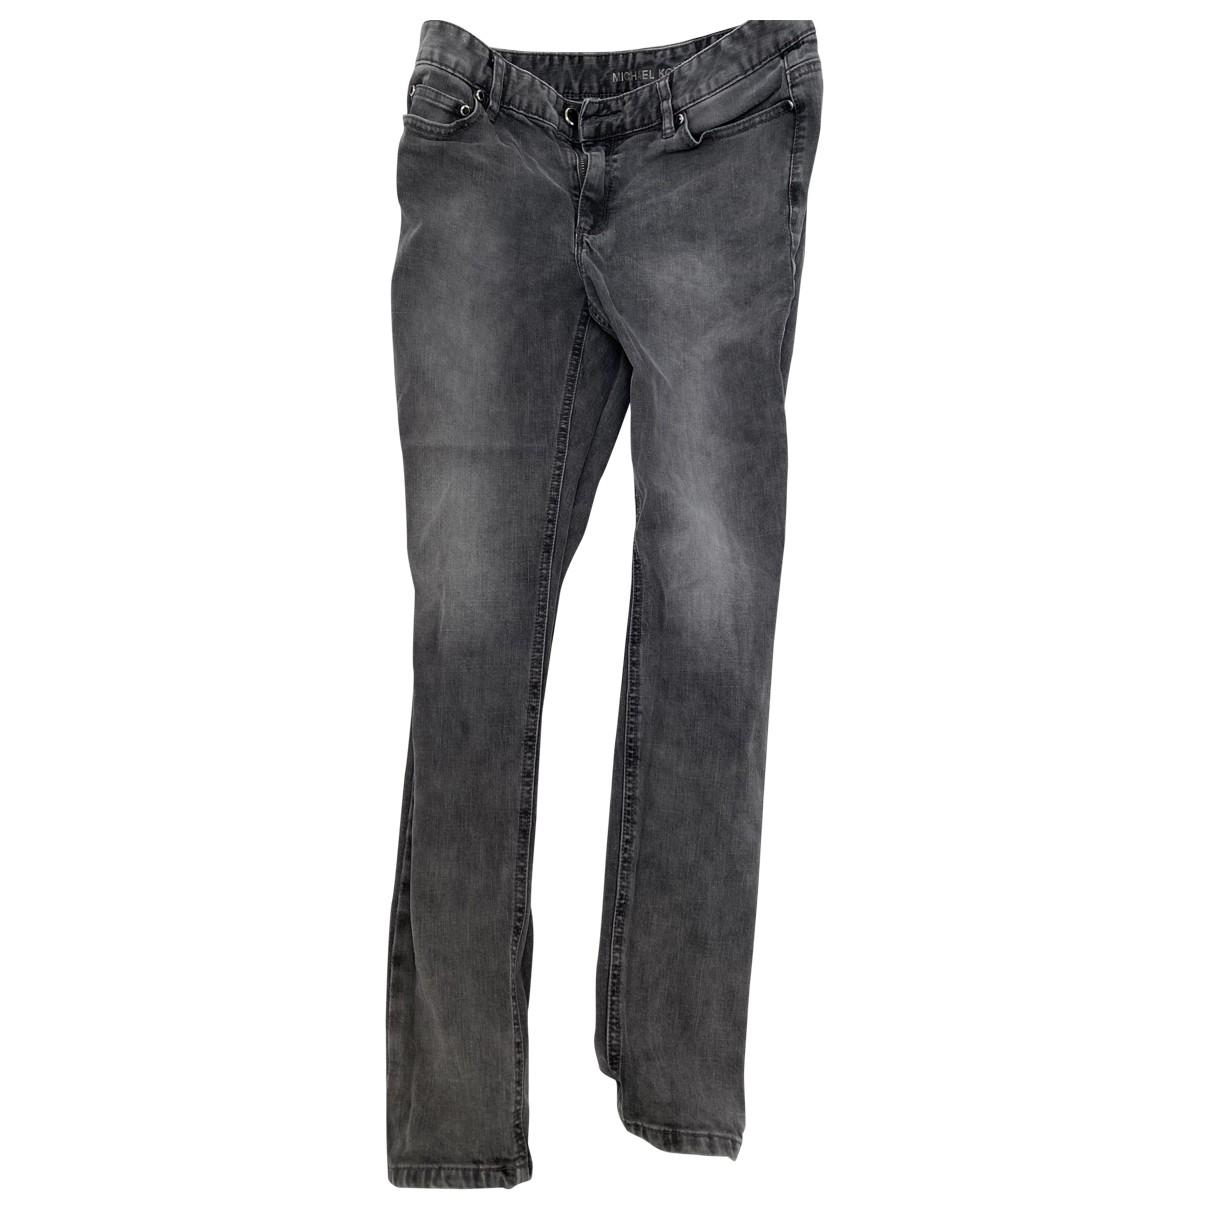 Michael Kors \N Black Cotton Jeans for Women 28 US